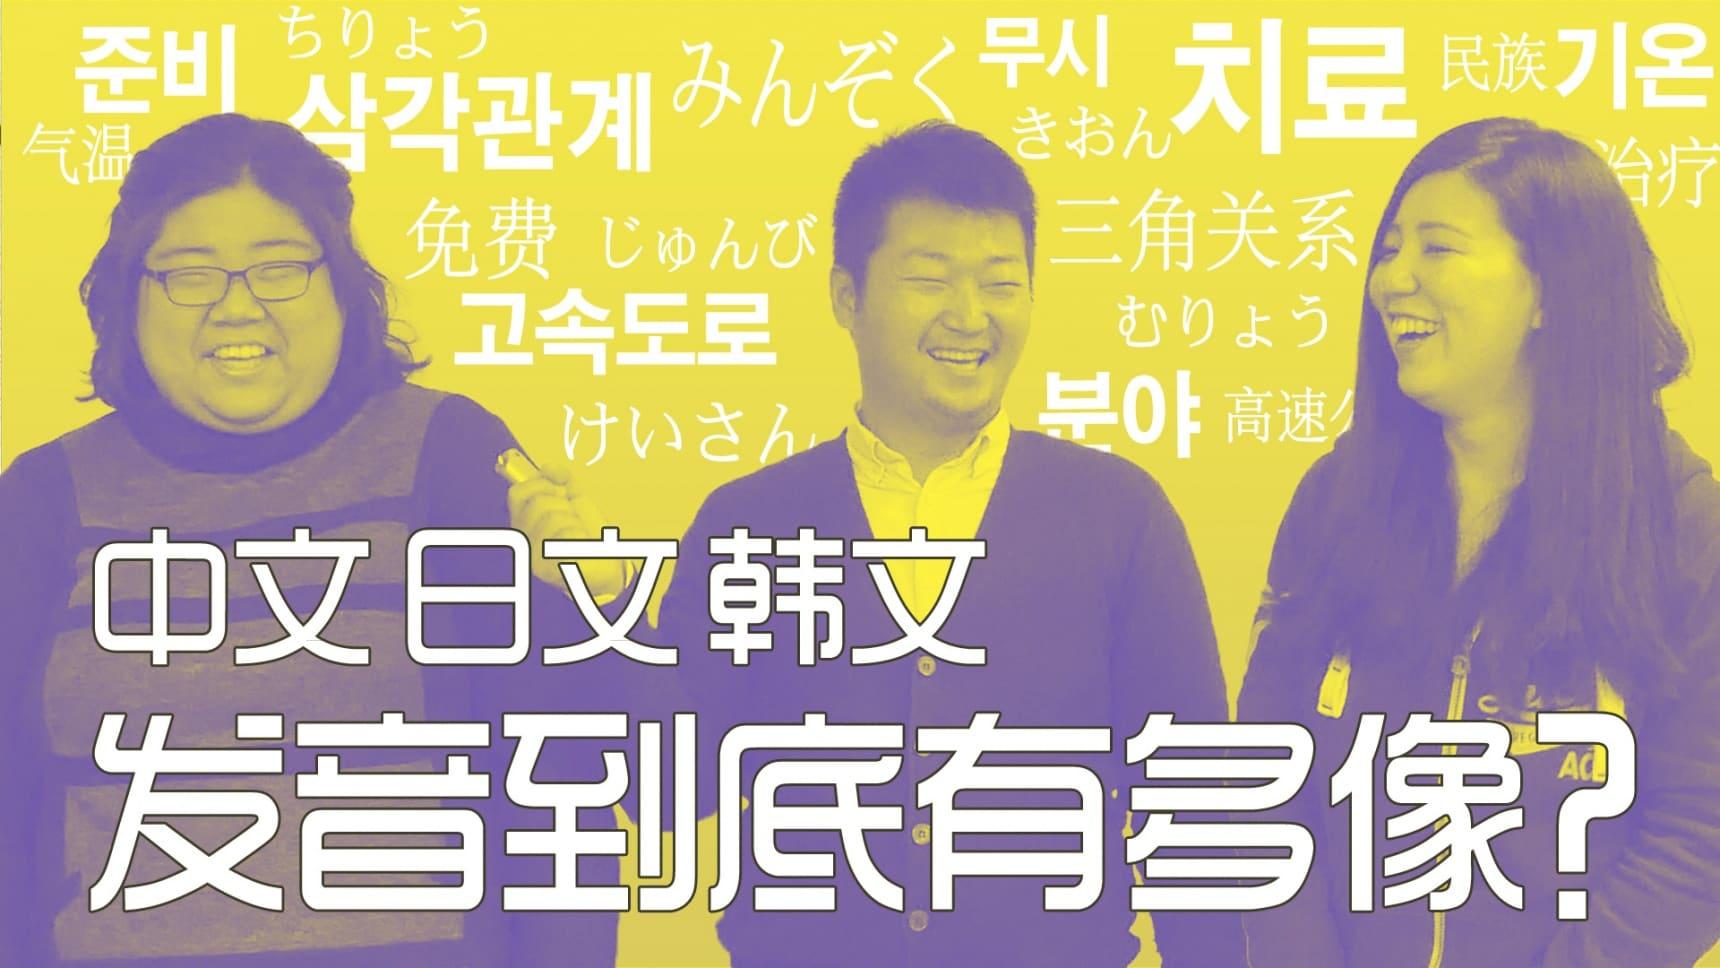 Oh my God!中文、日文、韩文这三国语言的某些发音竟如此相像?